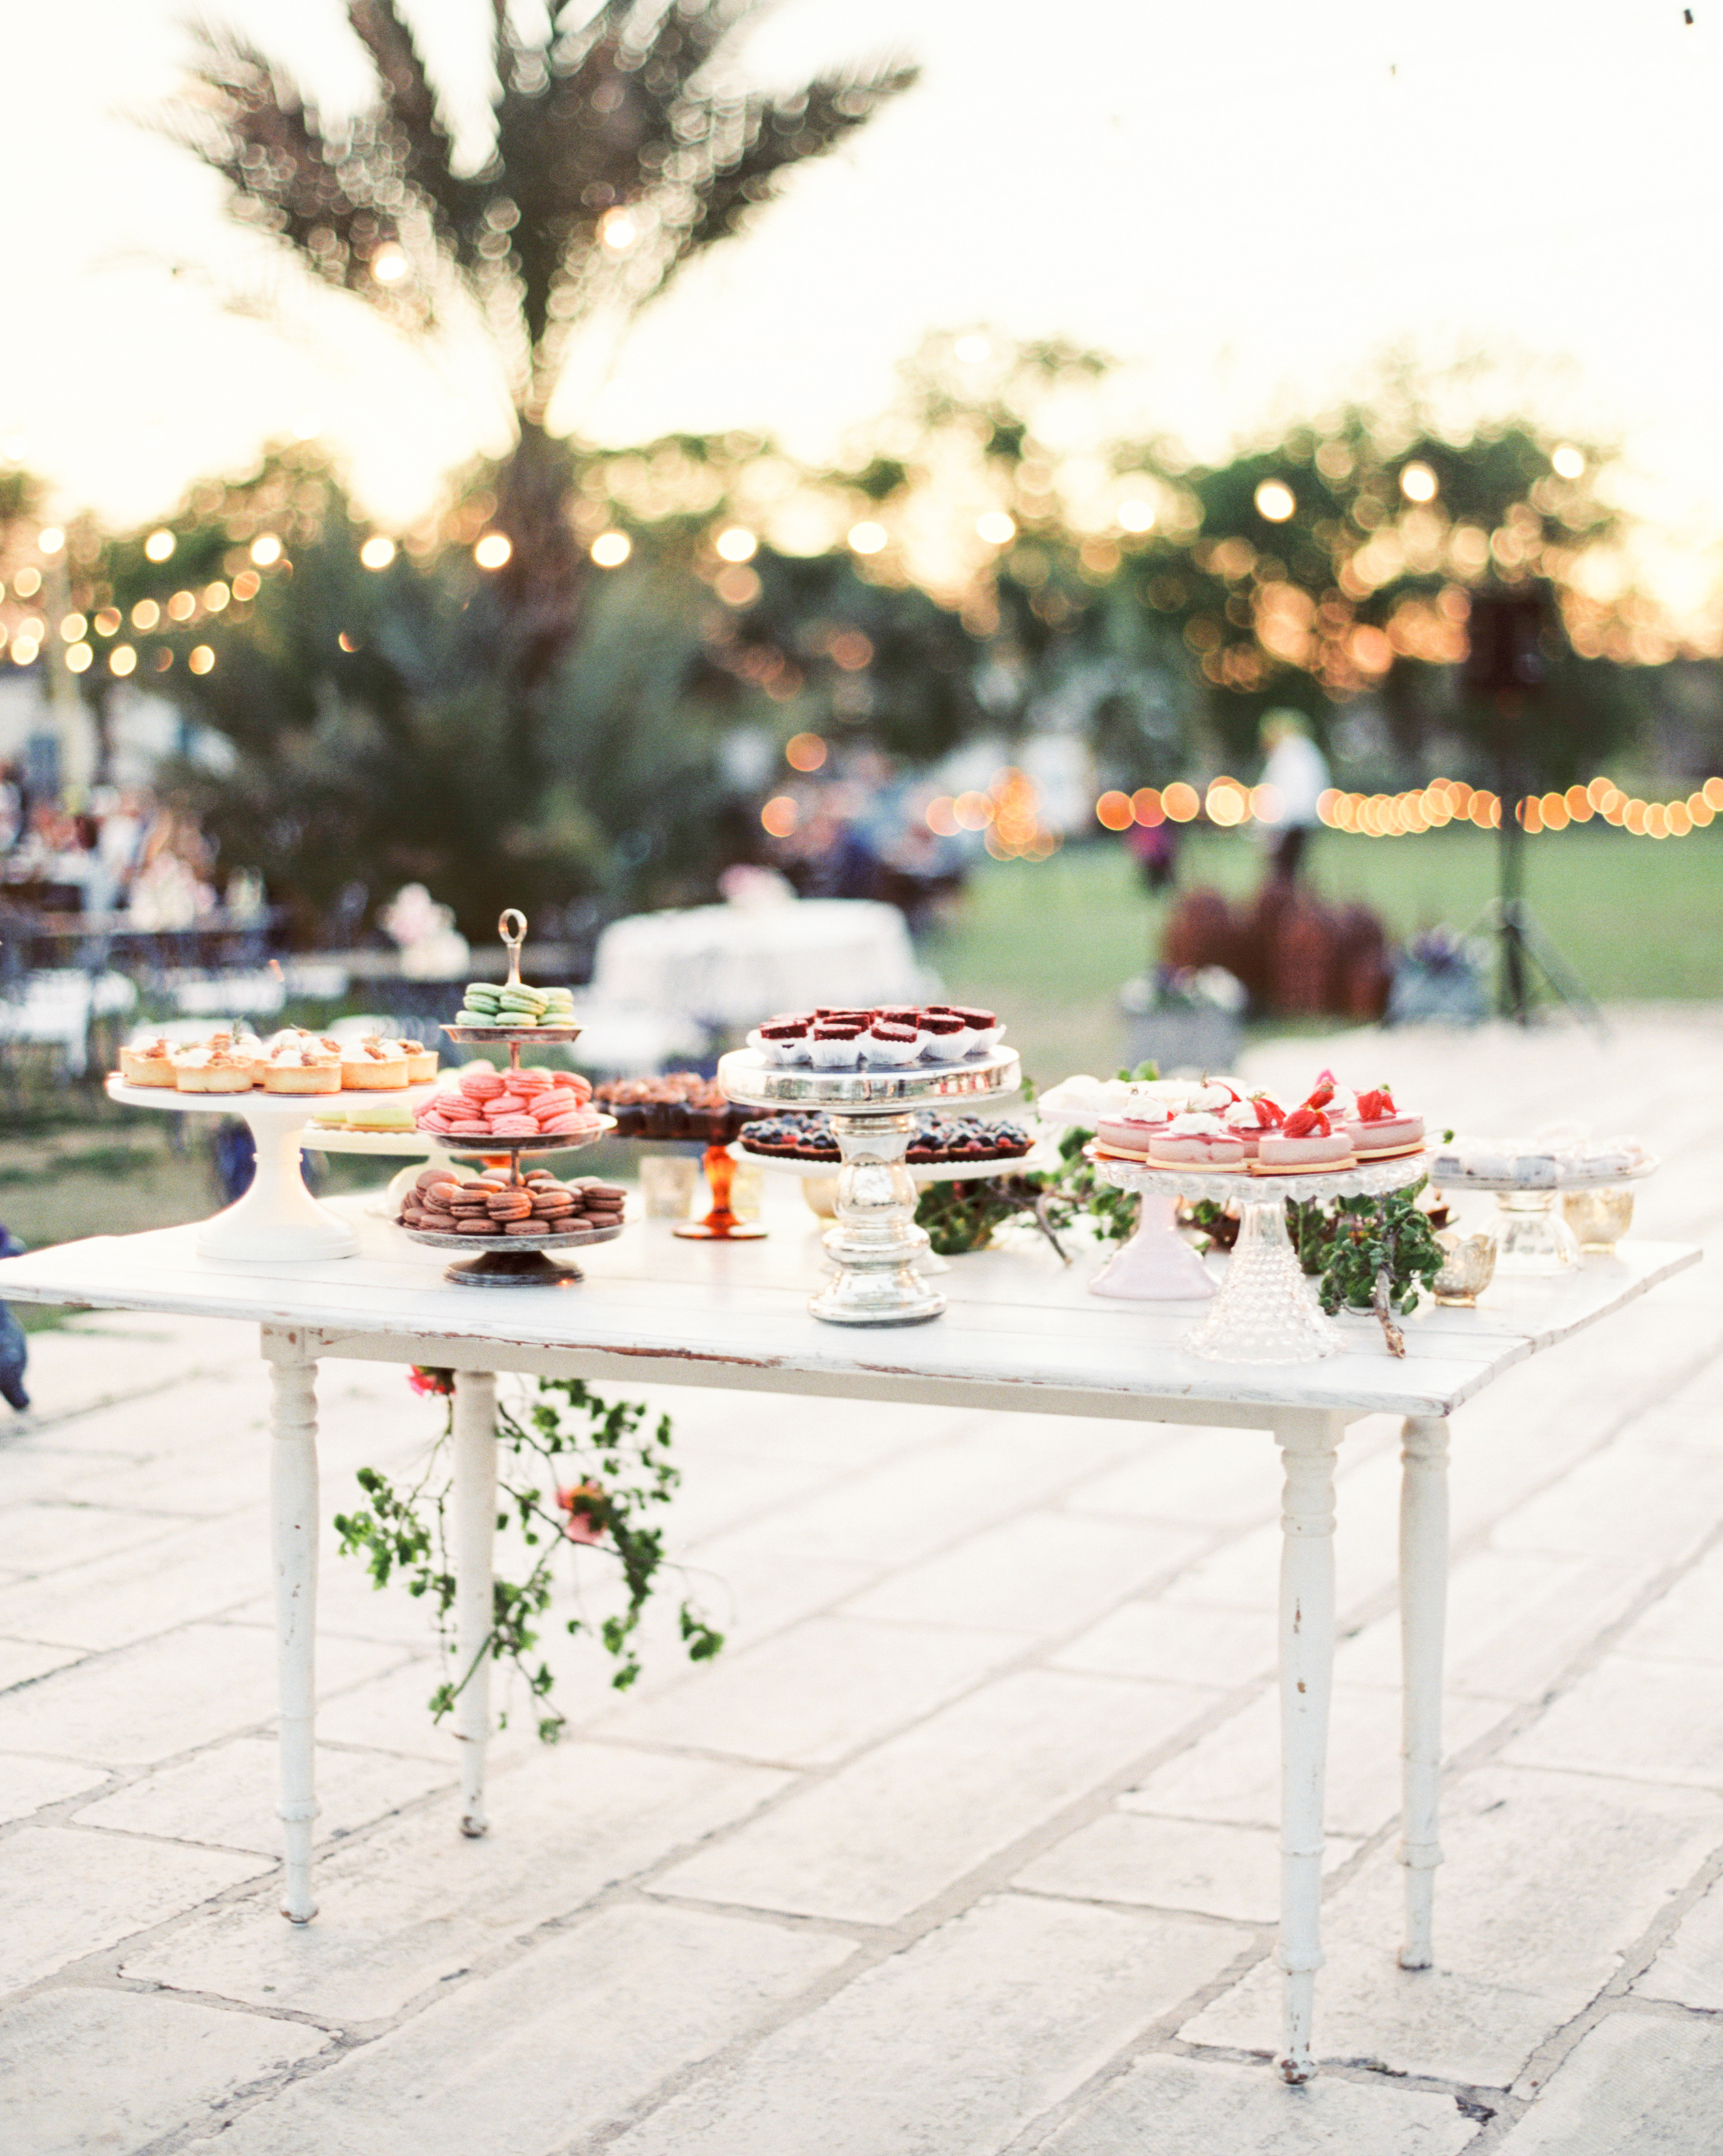 paige-chris-wedding-suite-121-s111485-0914.jpg